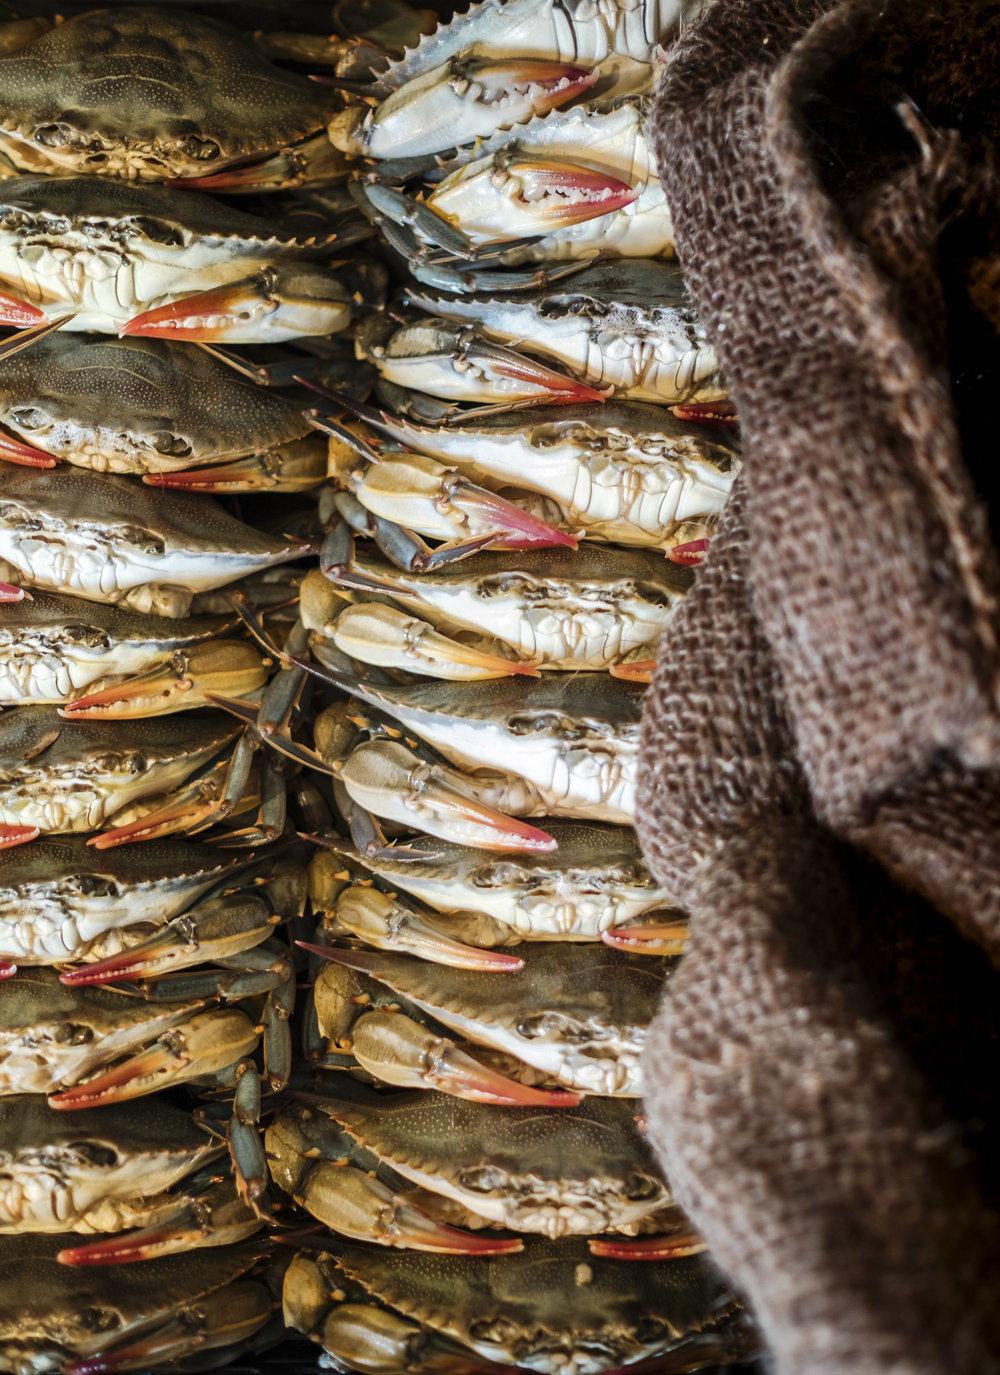 beau_kester_savannah_magazine_photographer_crab_lifestyle-25.jpg